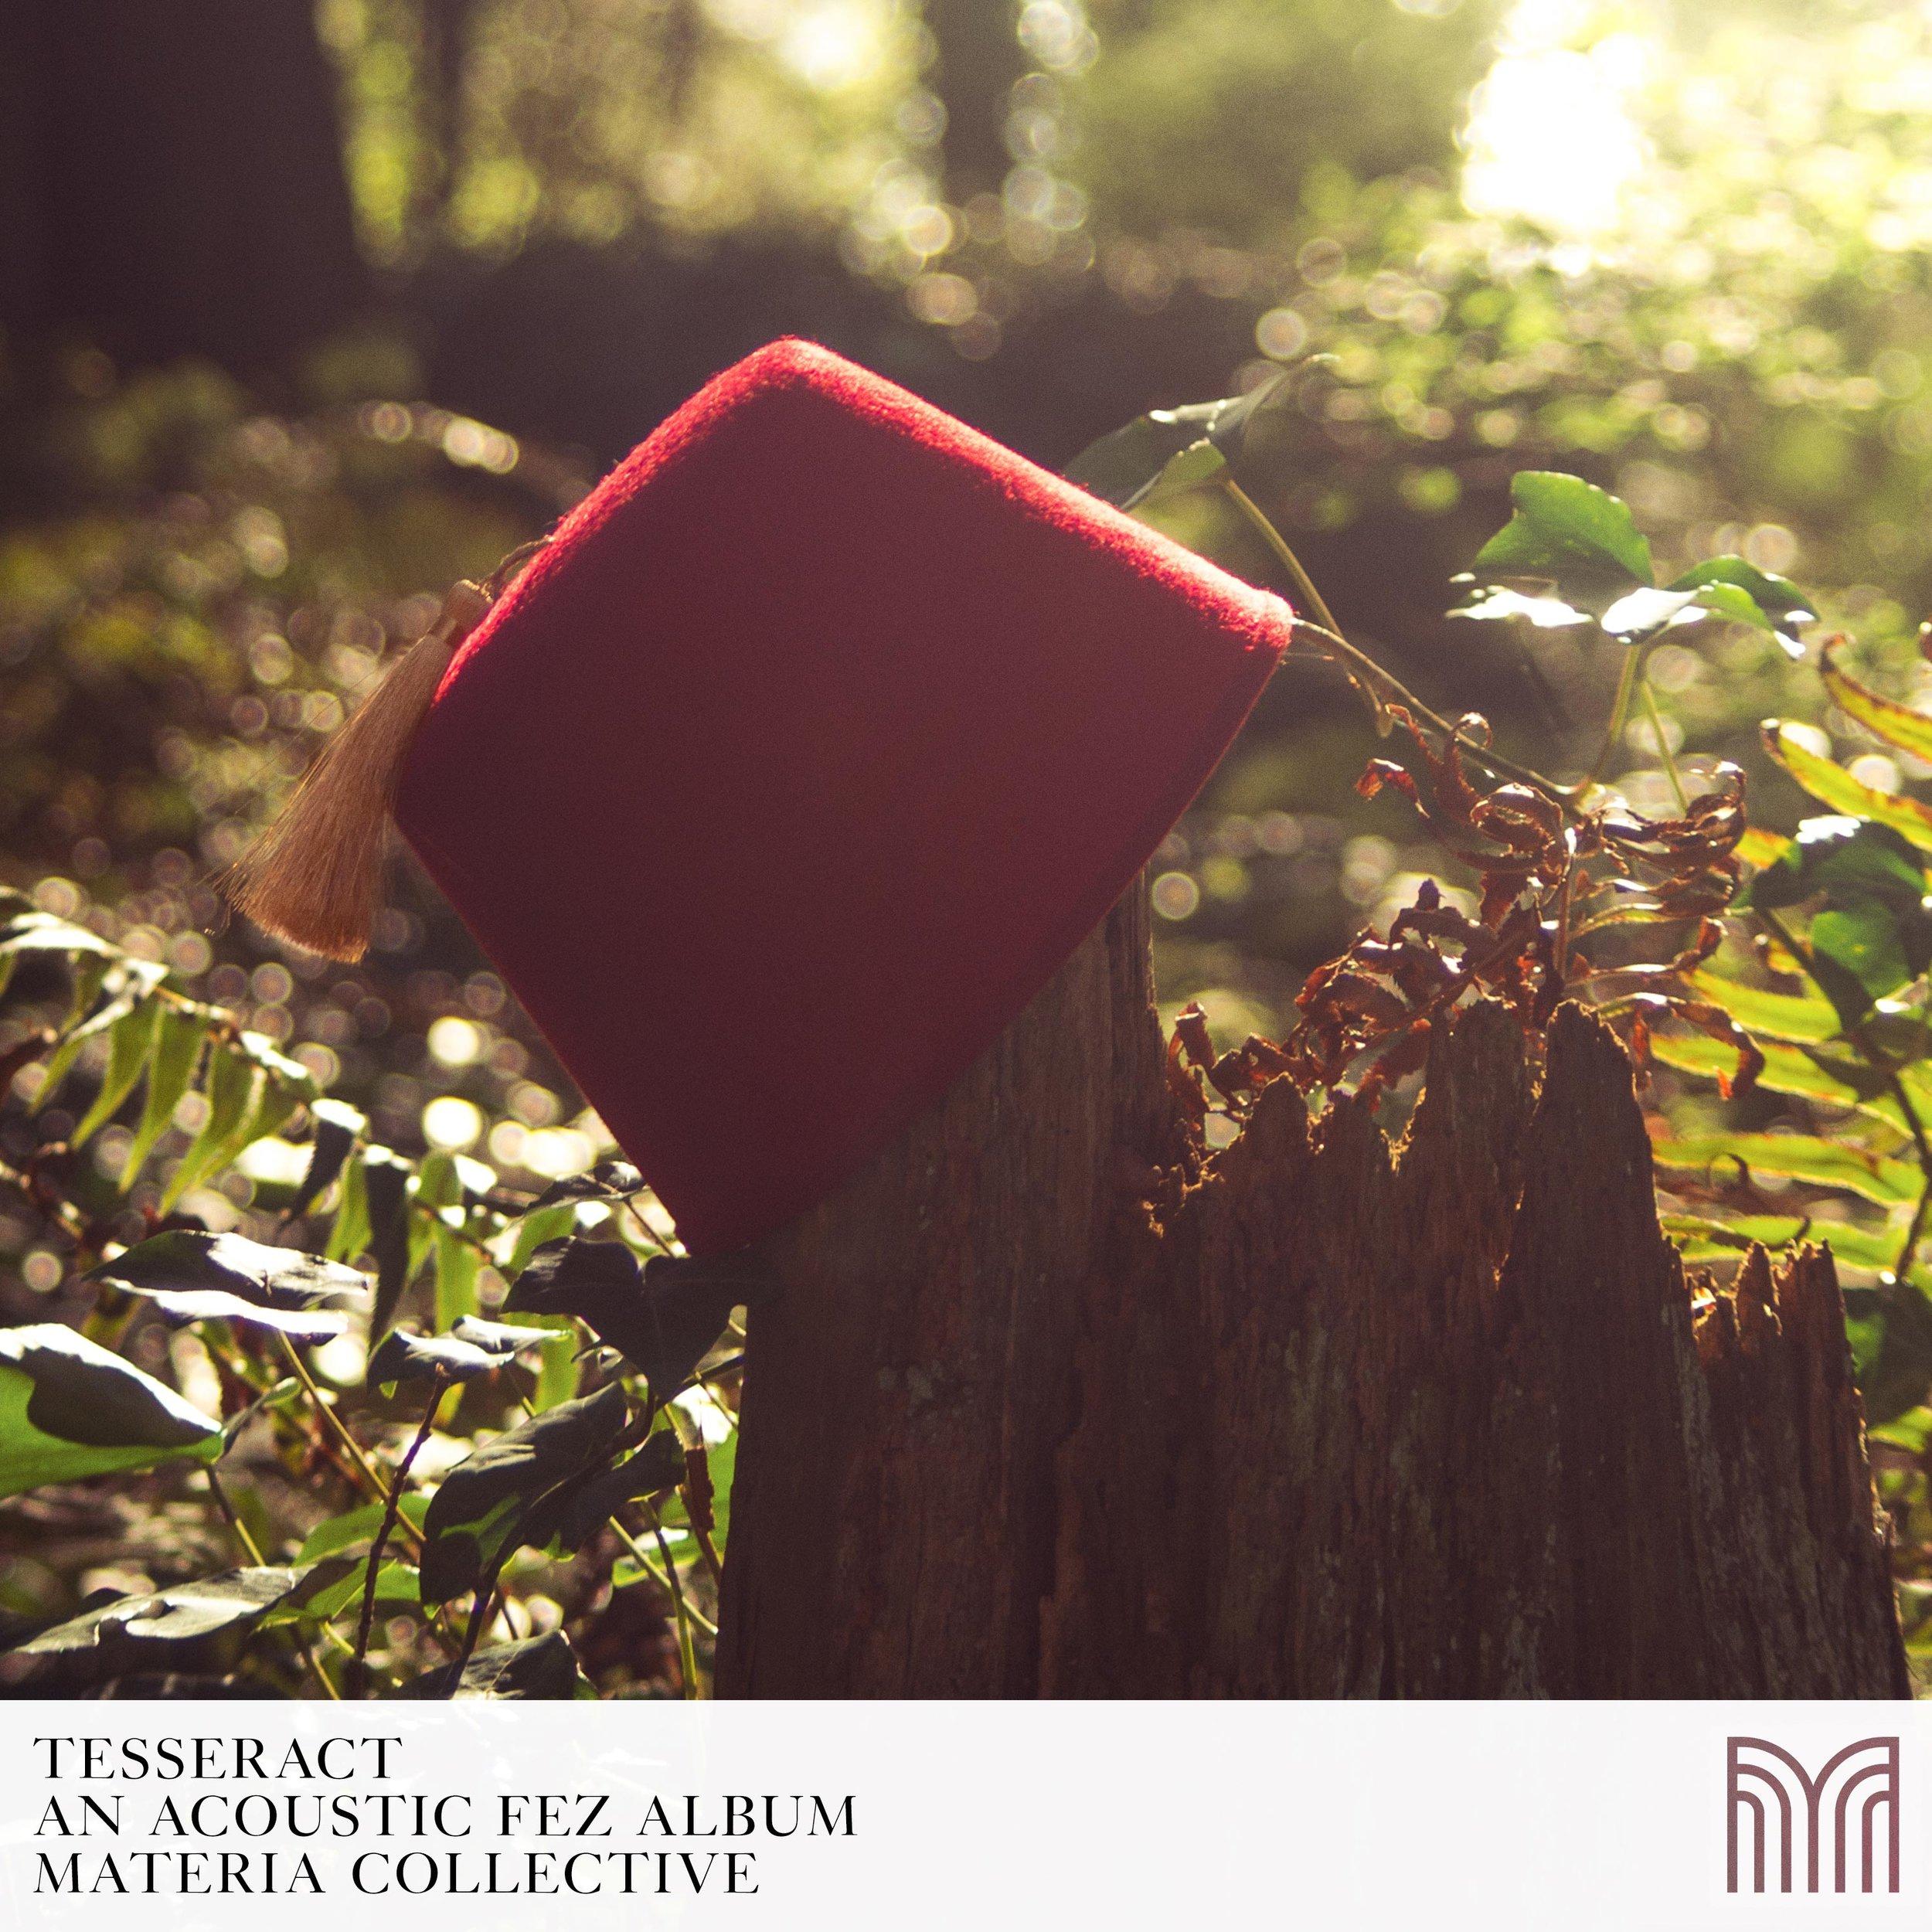 TESSERACT: An Acoustic Fez Album      33. Solving a Puzzle    (   Disasterpeace    - arr.    David Peacock   )